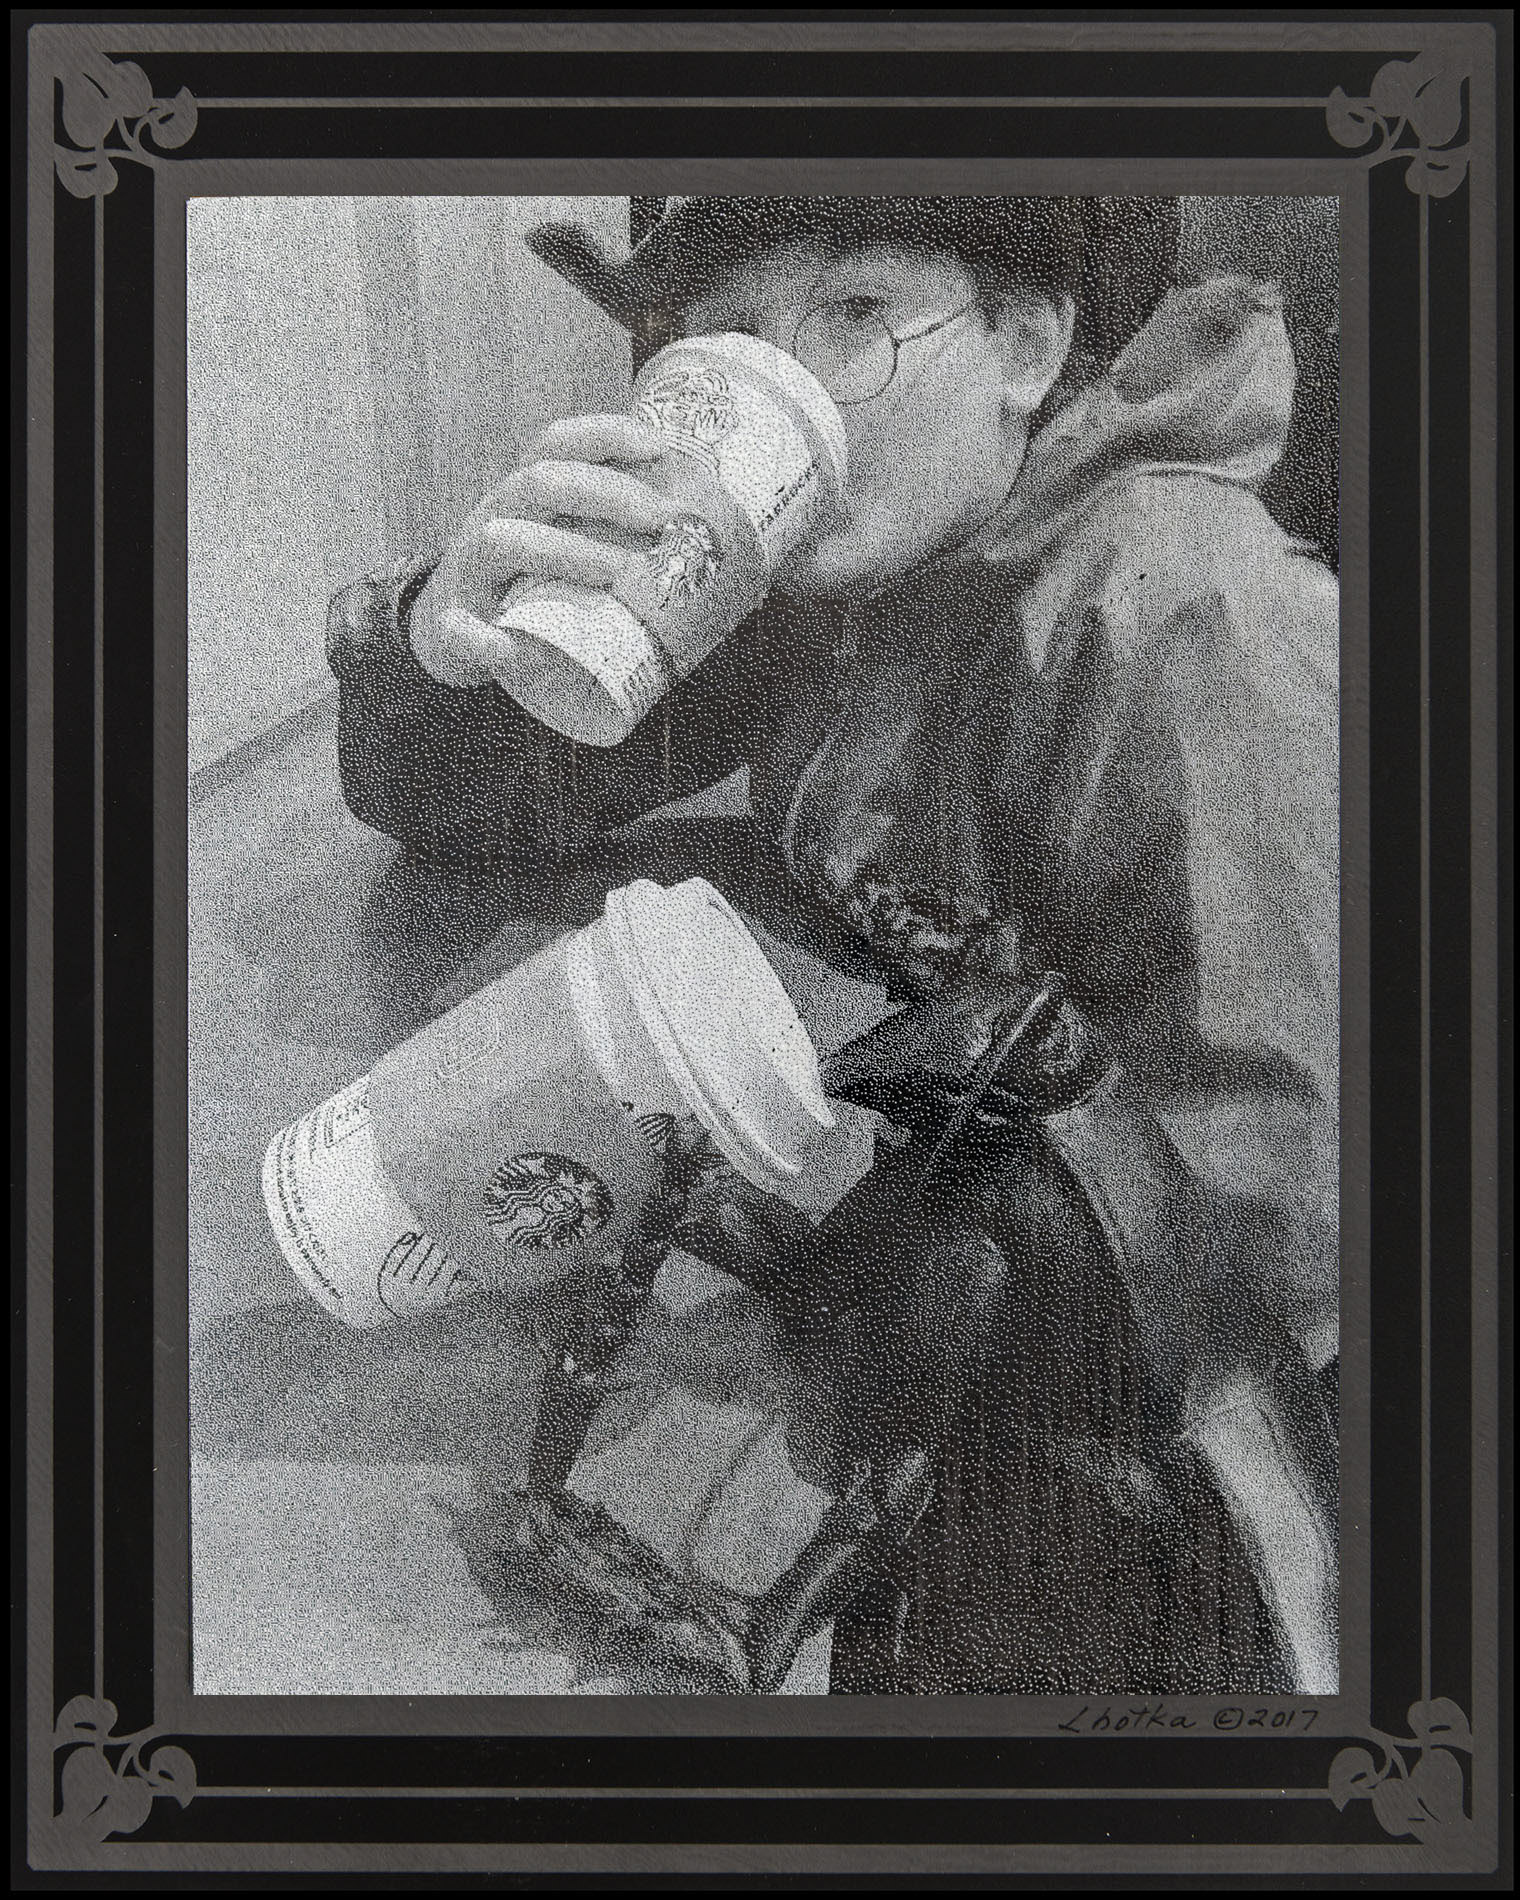 Coffee Break  8 x 10  caustigram mounted on laser engraved acrylic